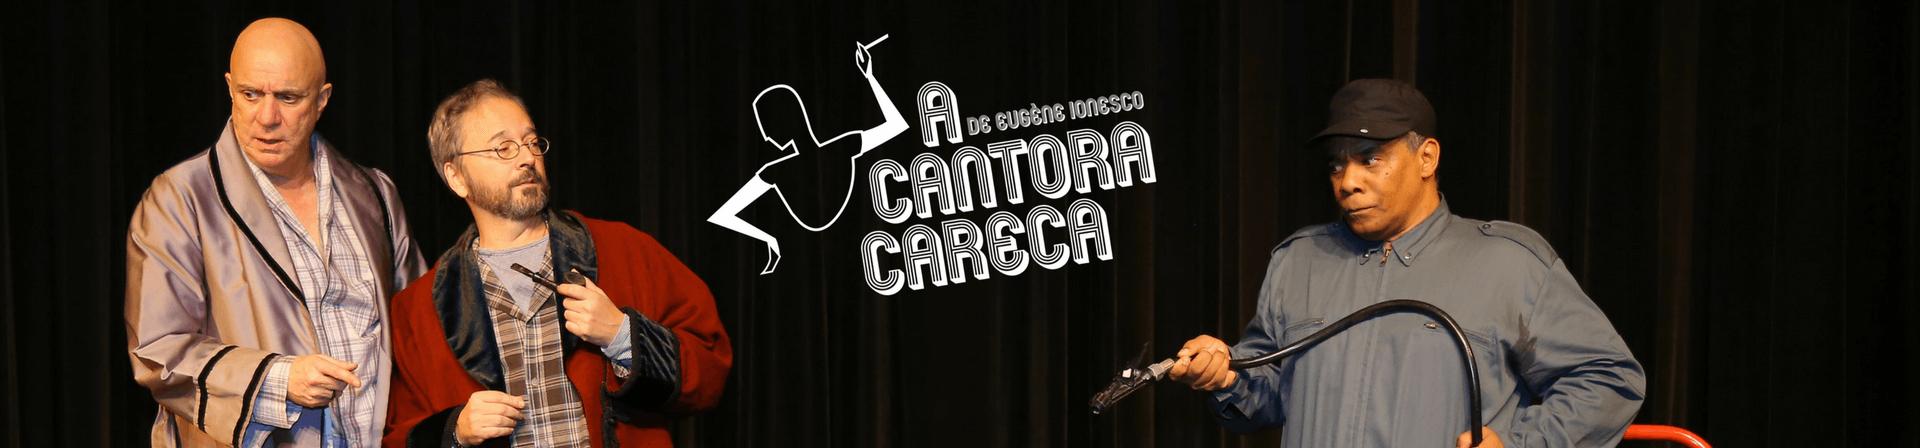 banner-cantora-careca